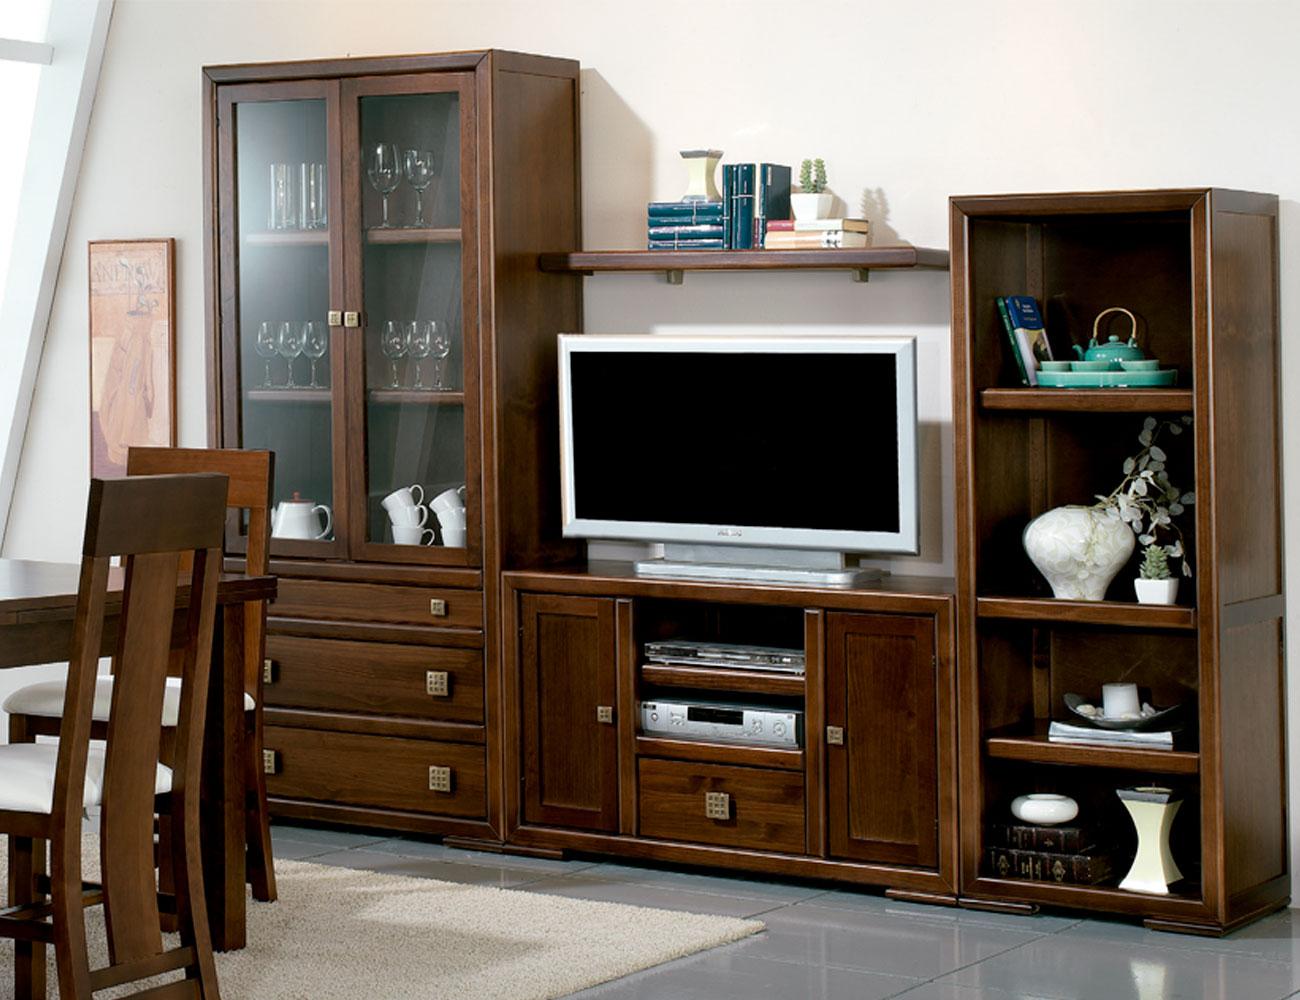 Composicion12 mueble salon comedor5